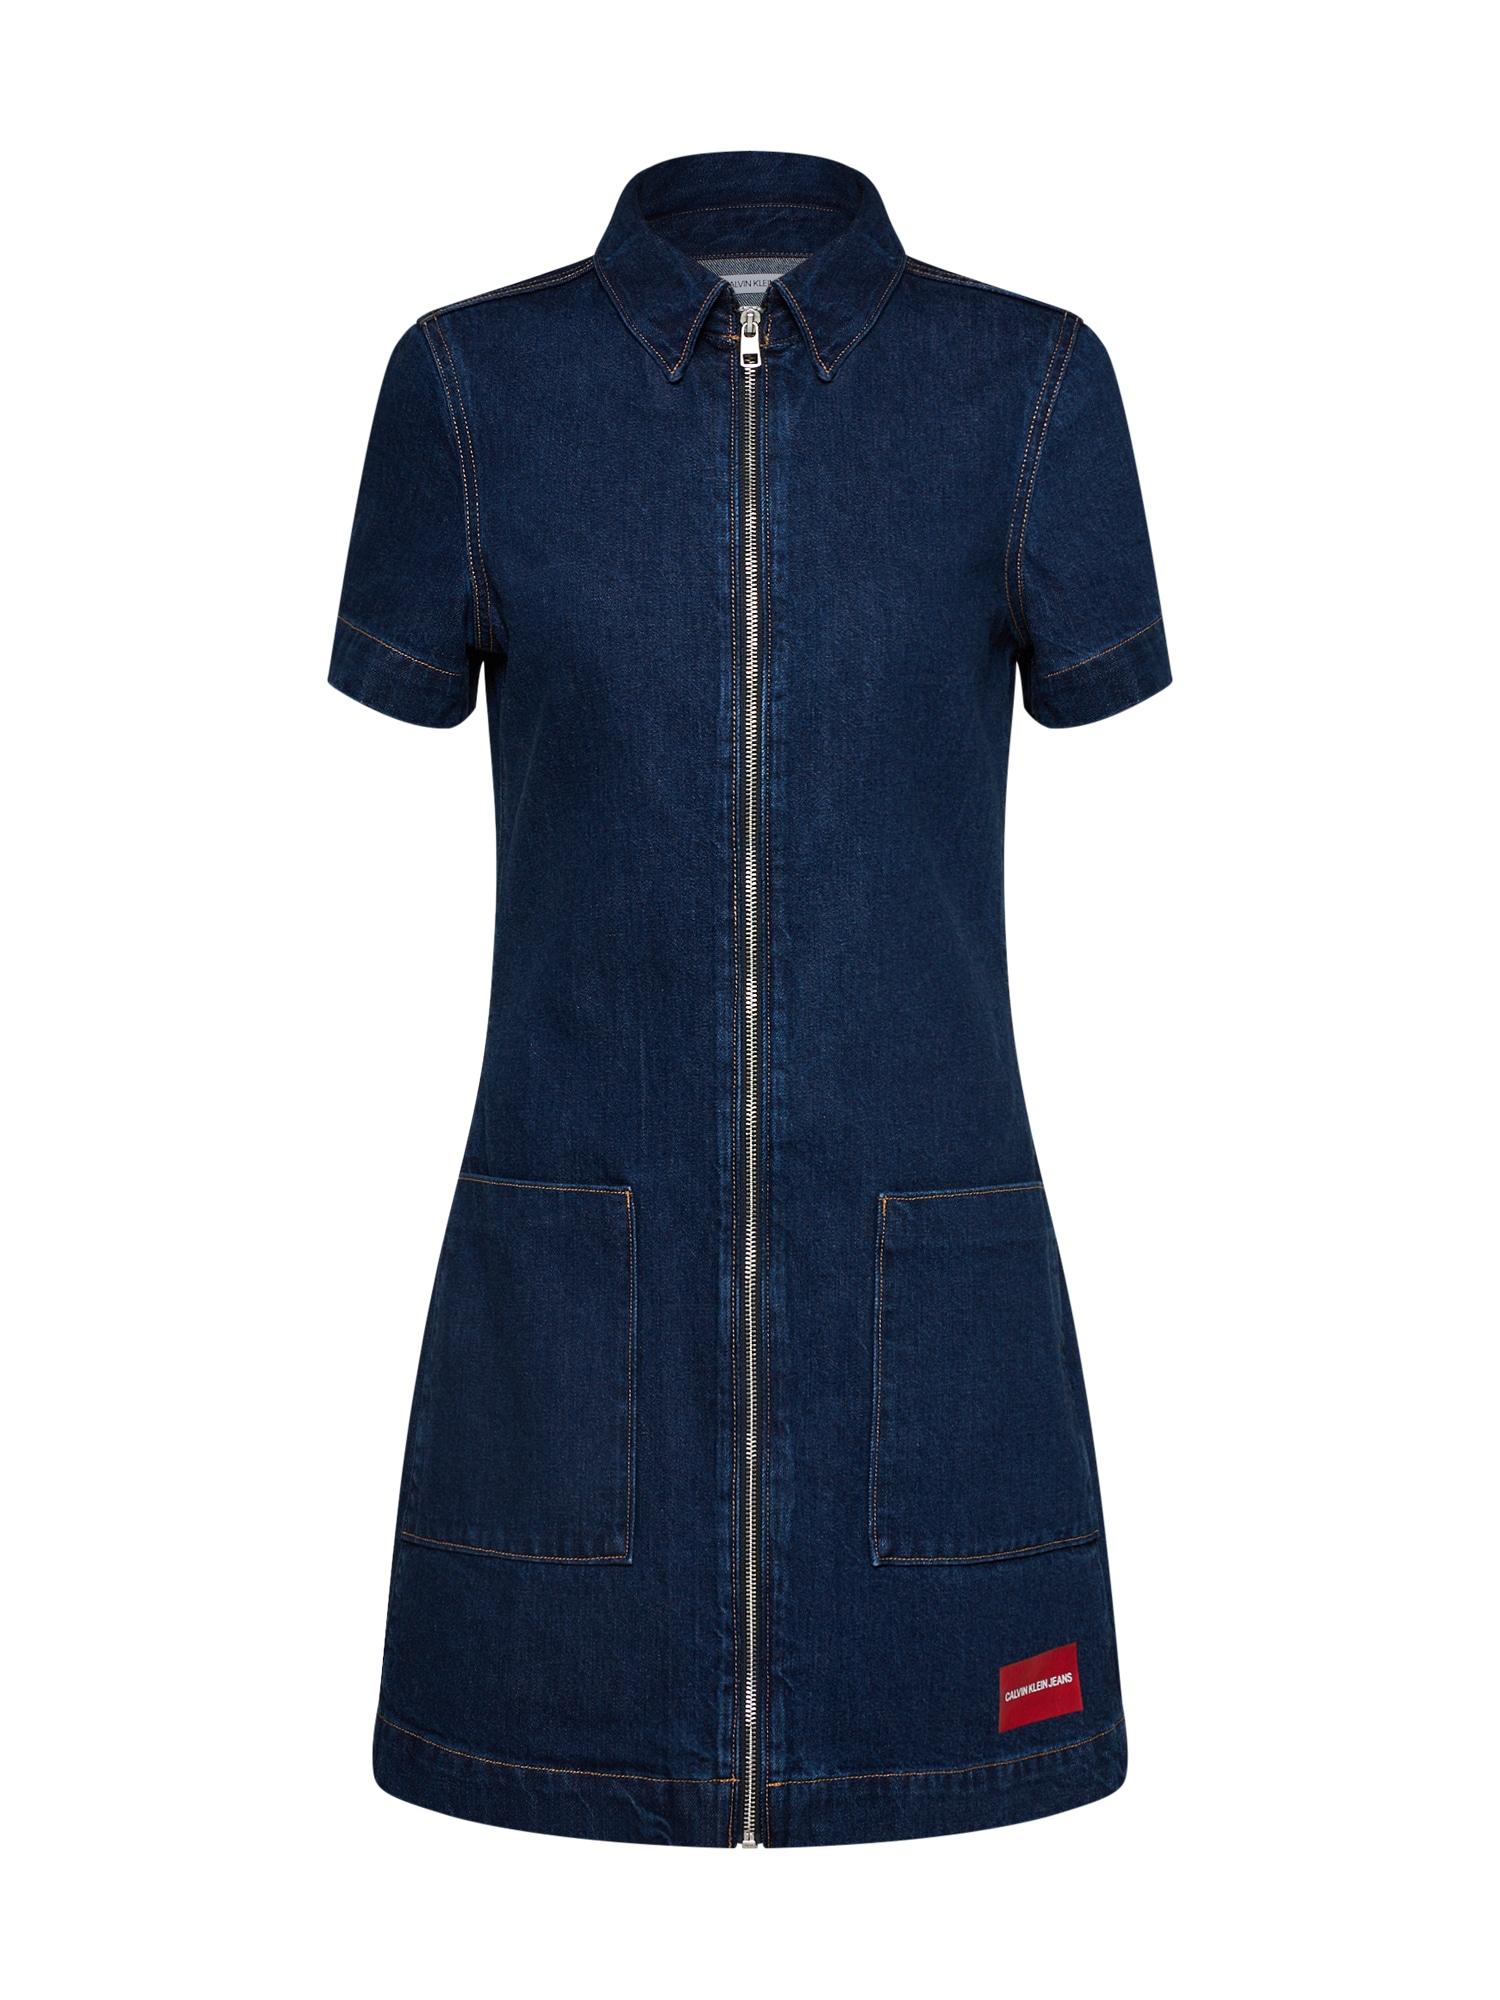 Šaty Zip Front Diner modrá džínovina Calvin Klein Jeans